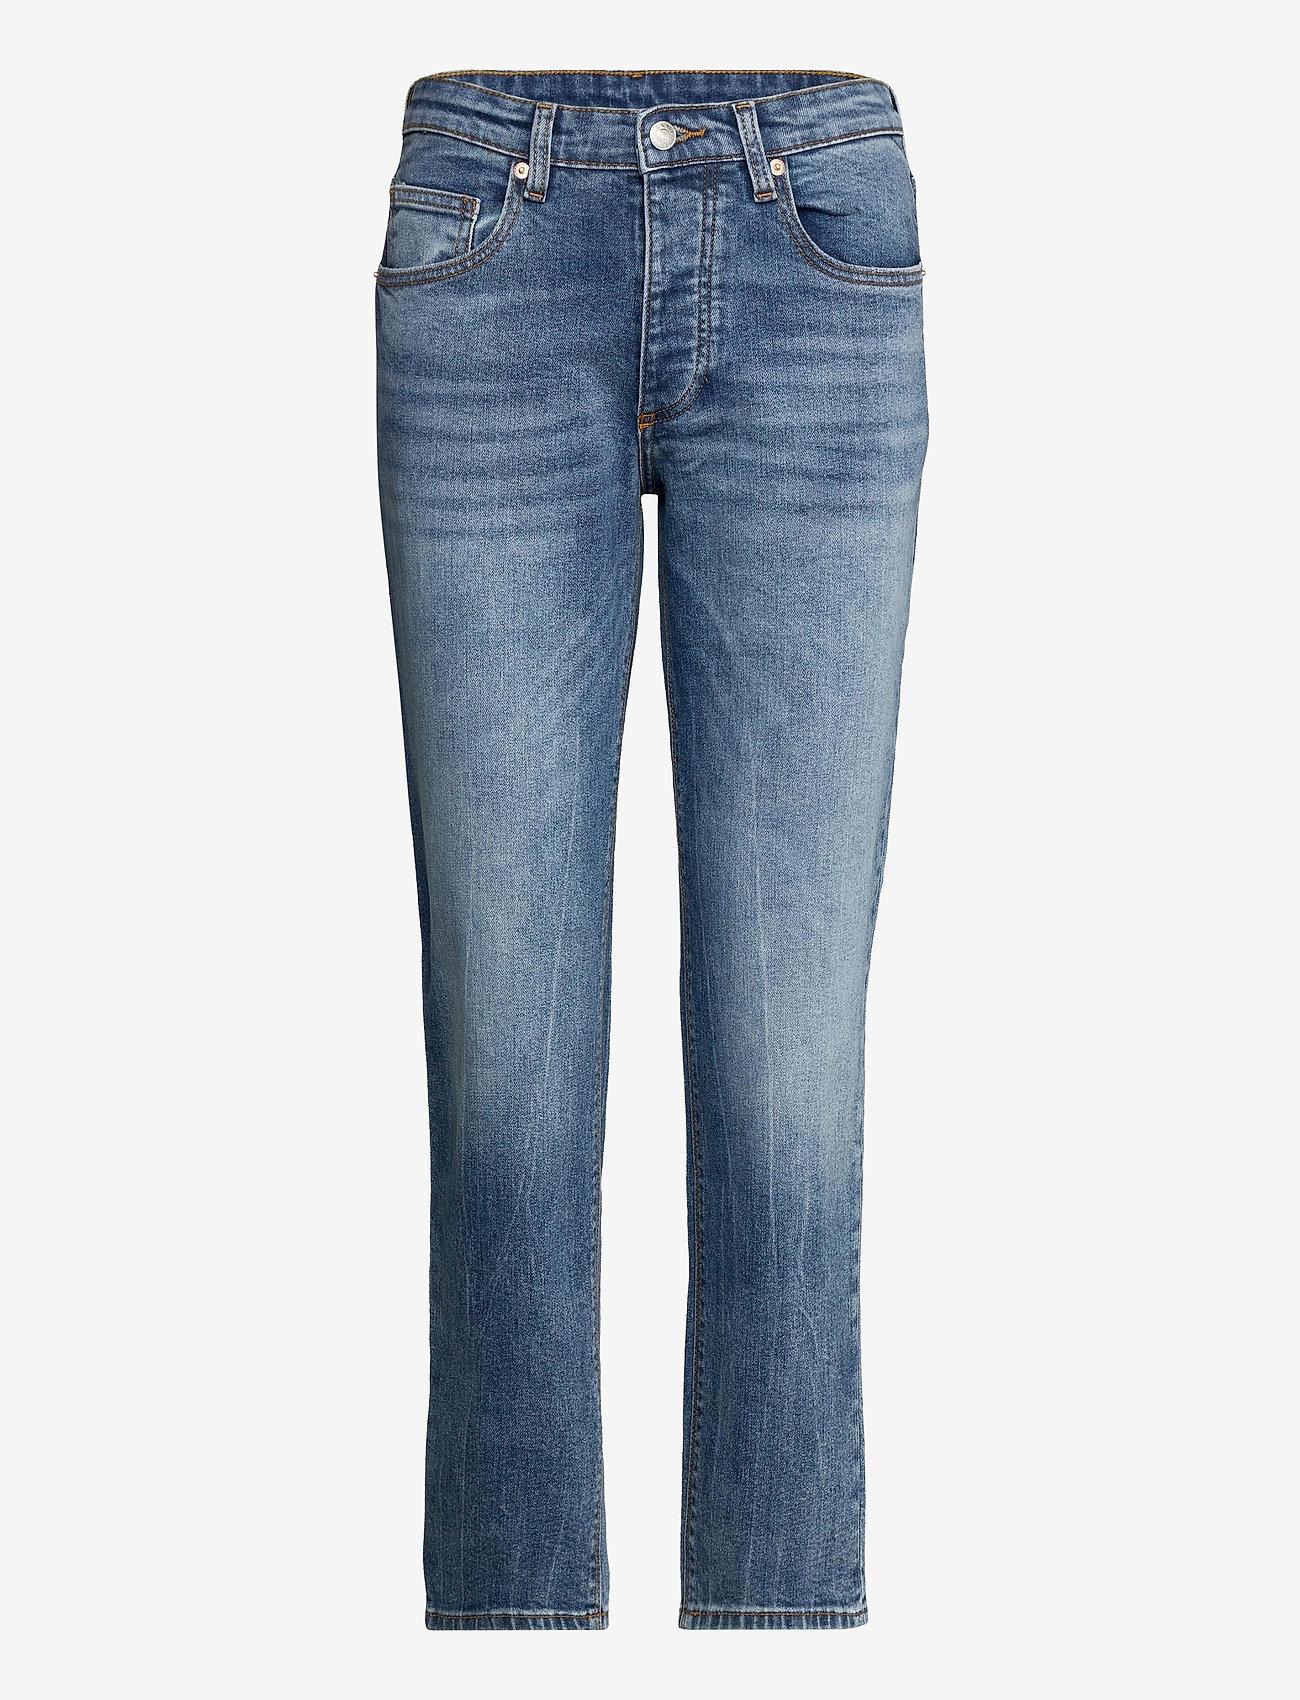 Zadig & Voltaire - MAMMA DENIM ECO LIGHT DENIM - straight jeans - light blue - 1